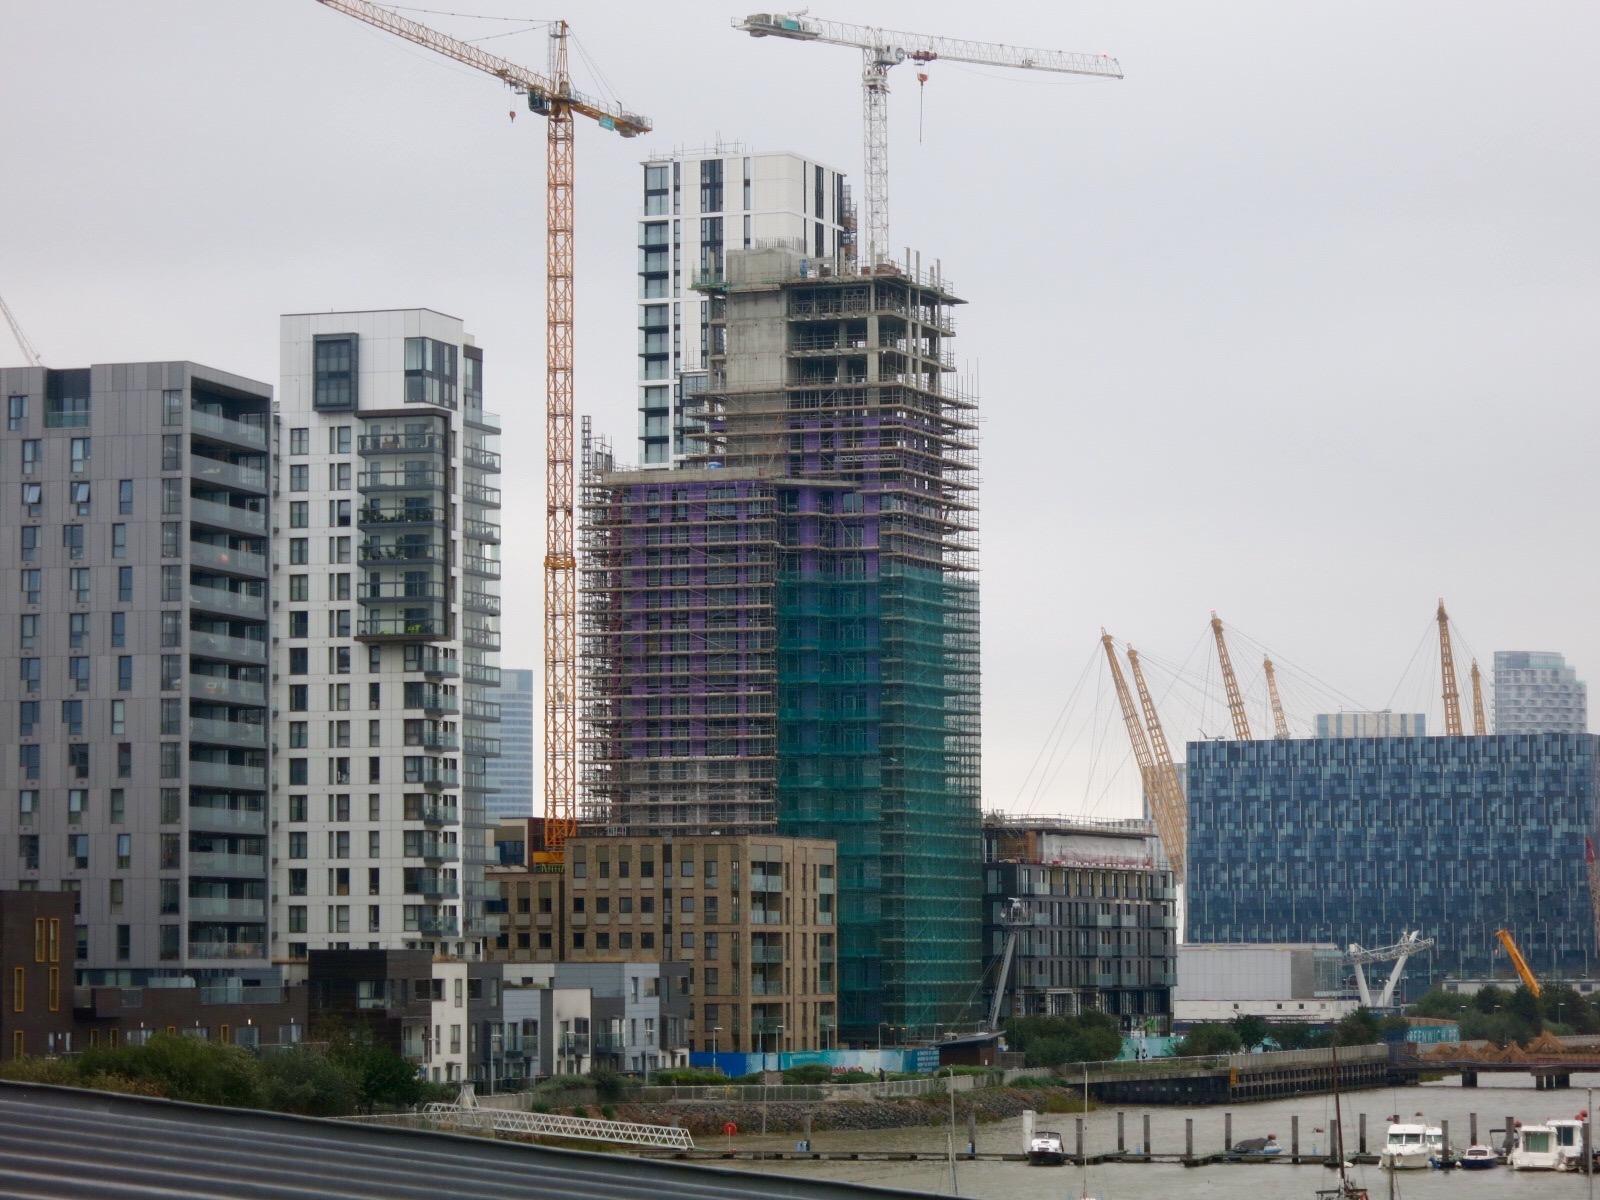 Construction progress - The Lighterman viewed from Greenwich Yacht Club - September 2016 [greenpen.london]